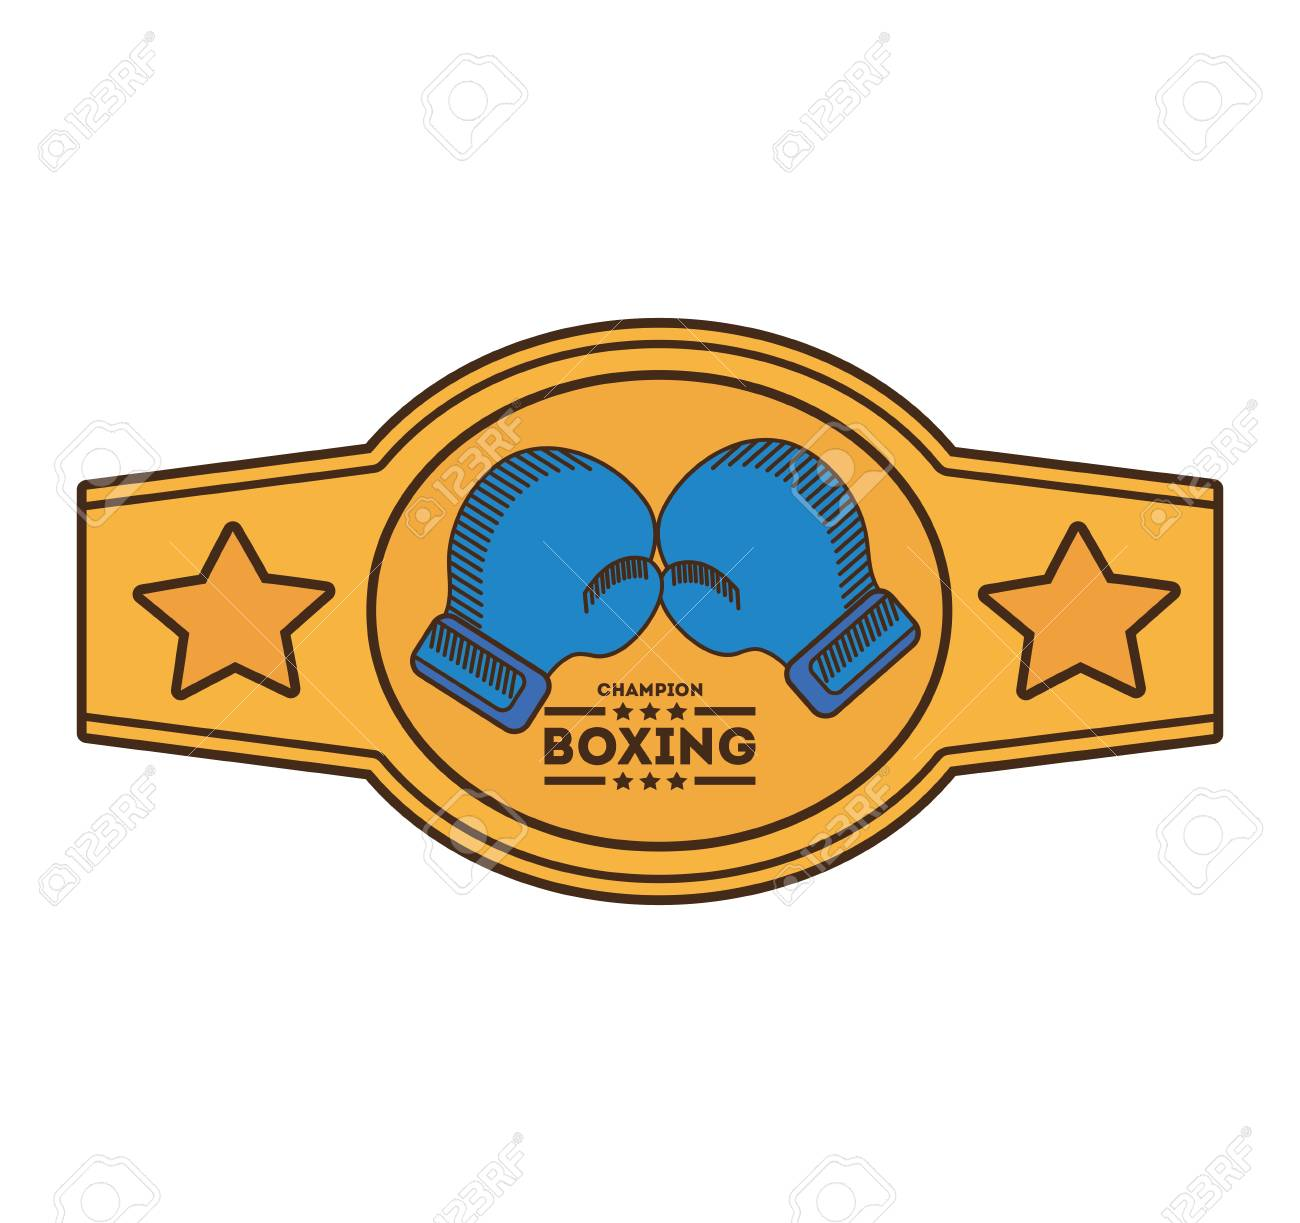 boxing championship belt isolated icon vector illustration design.